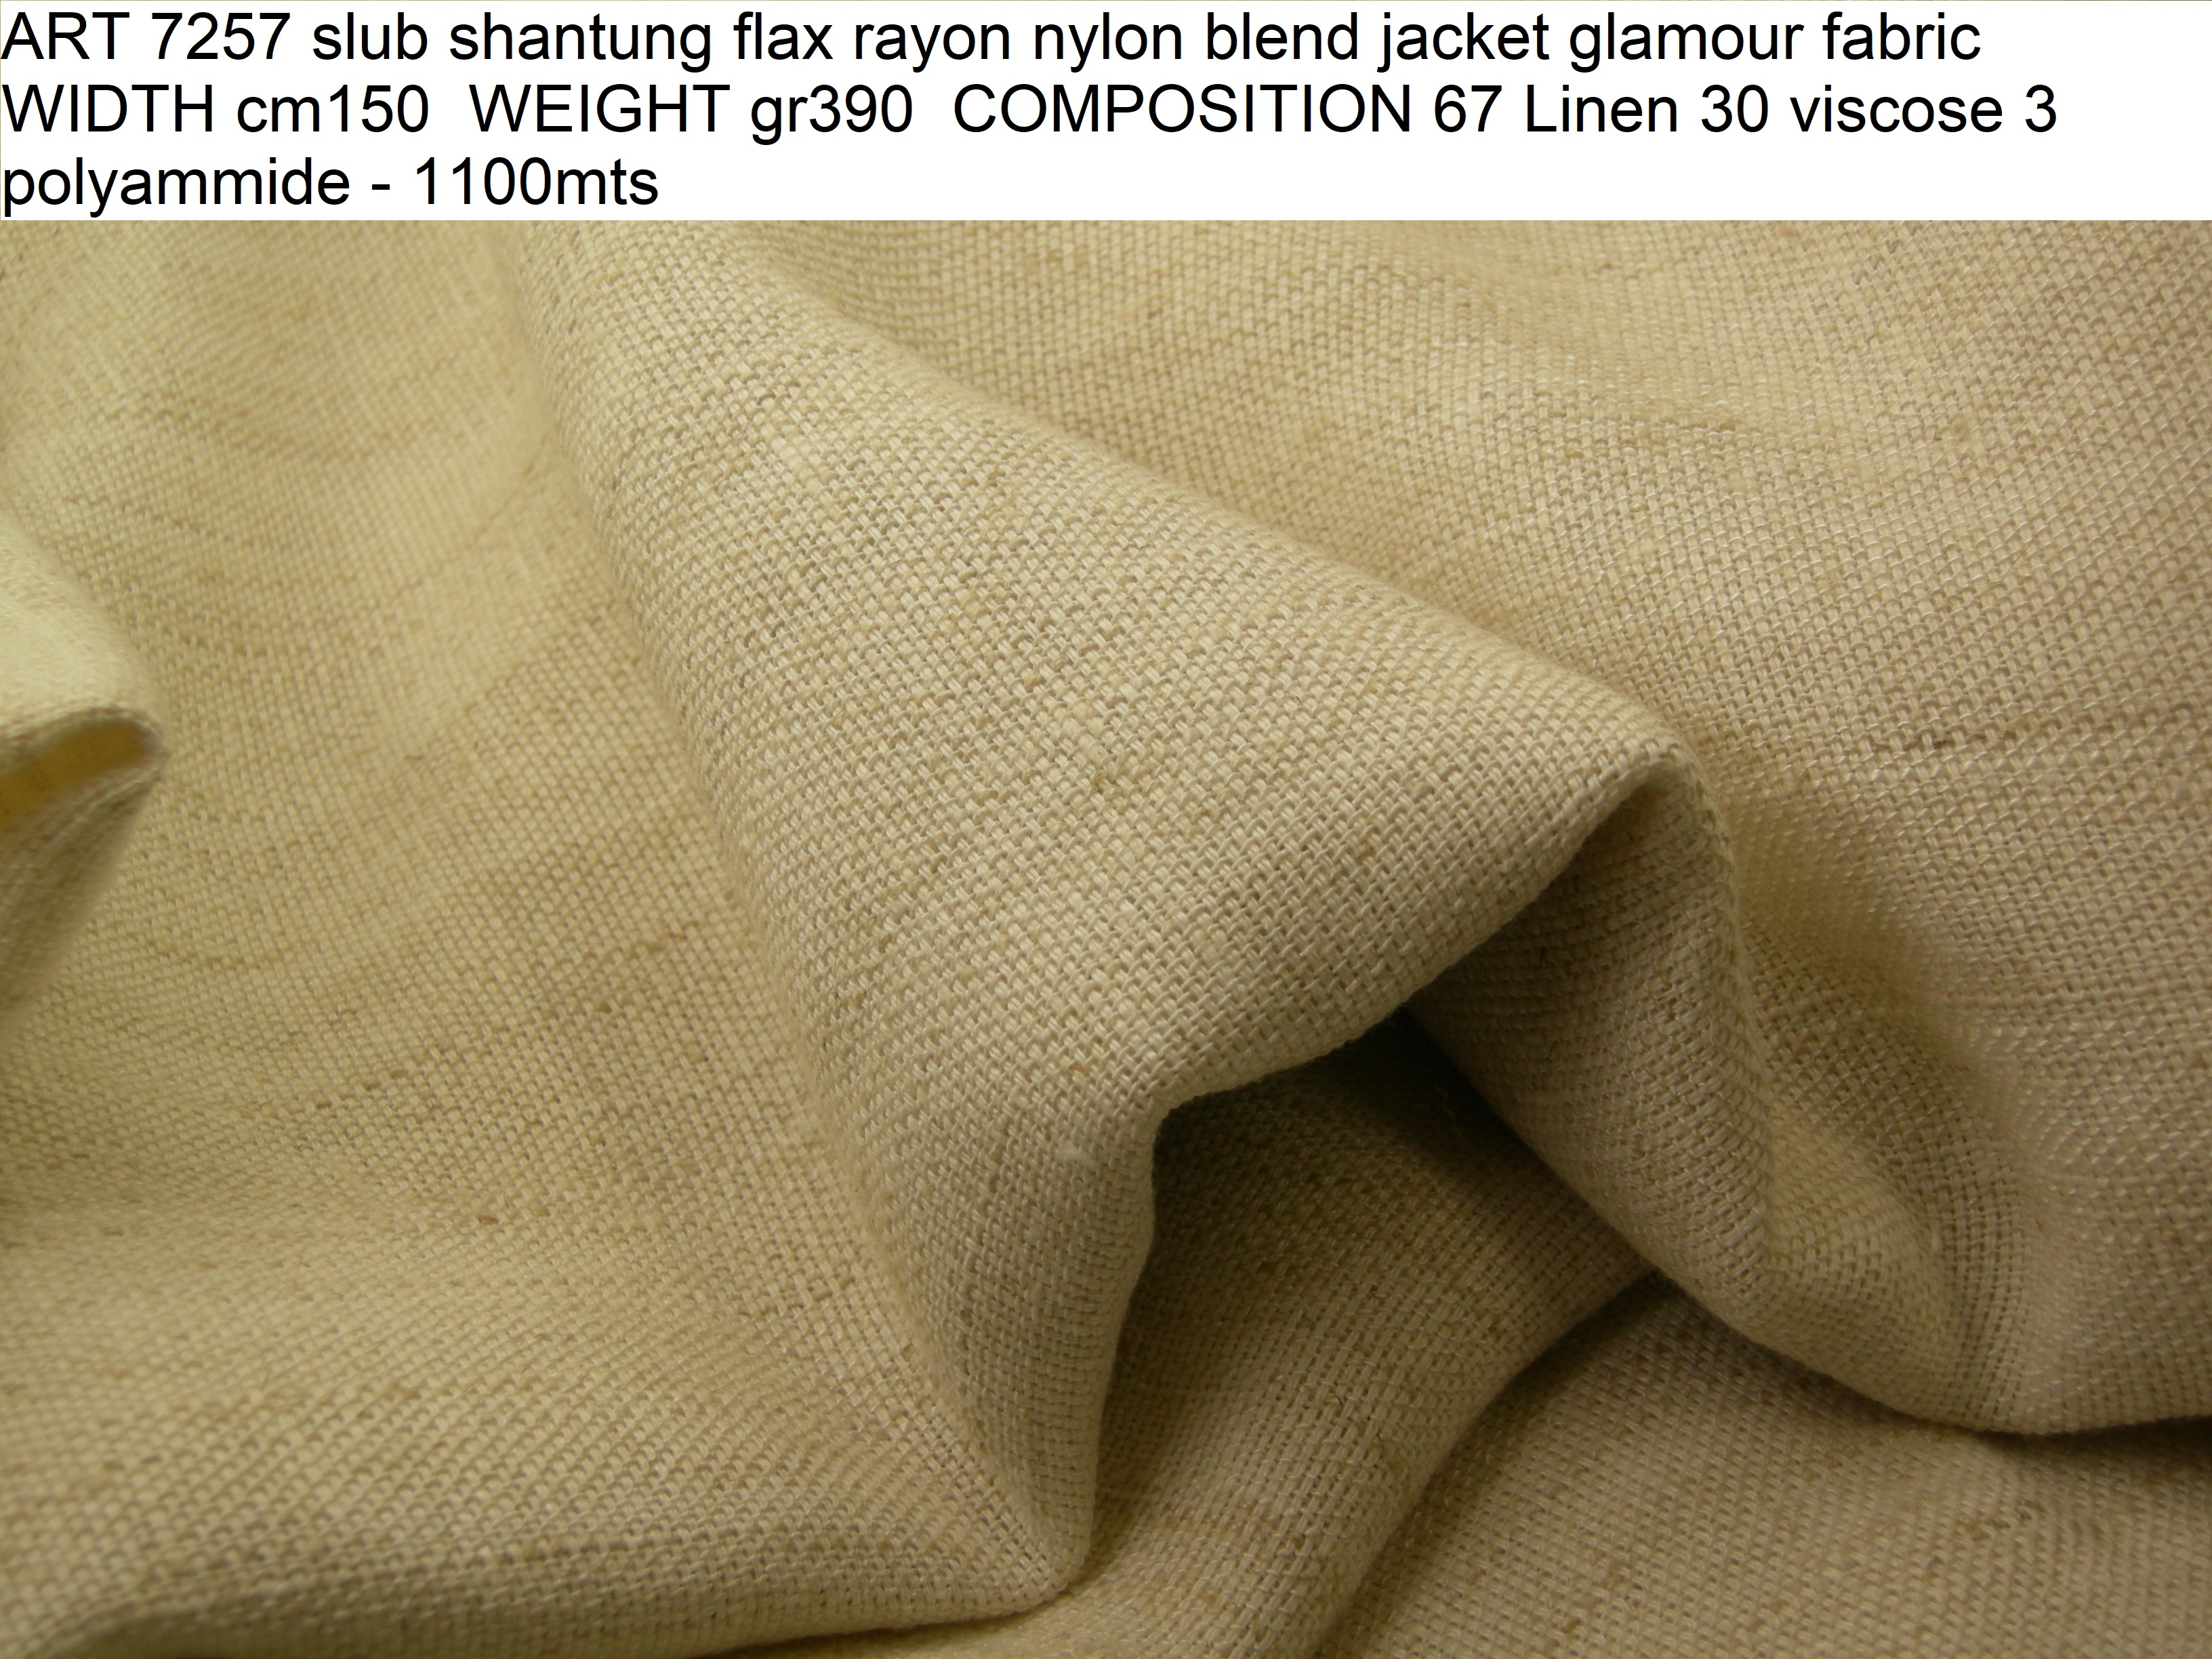 ART 7257 slub shantung flax rayon nylon blend jacket glamour fabric WIDTH cm150 WEIGHT gr390 COMPOSITION 67 Linen 30 viscose 3 polyammide - 1100mts